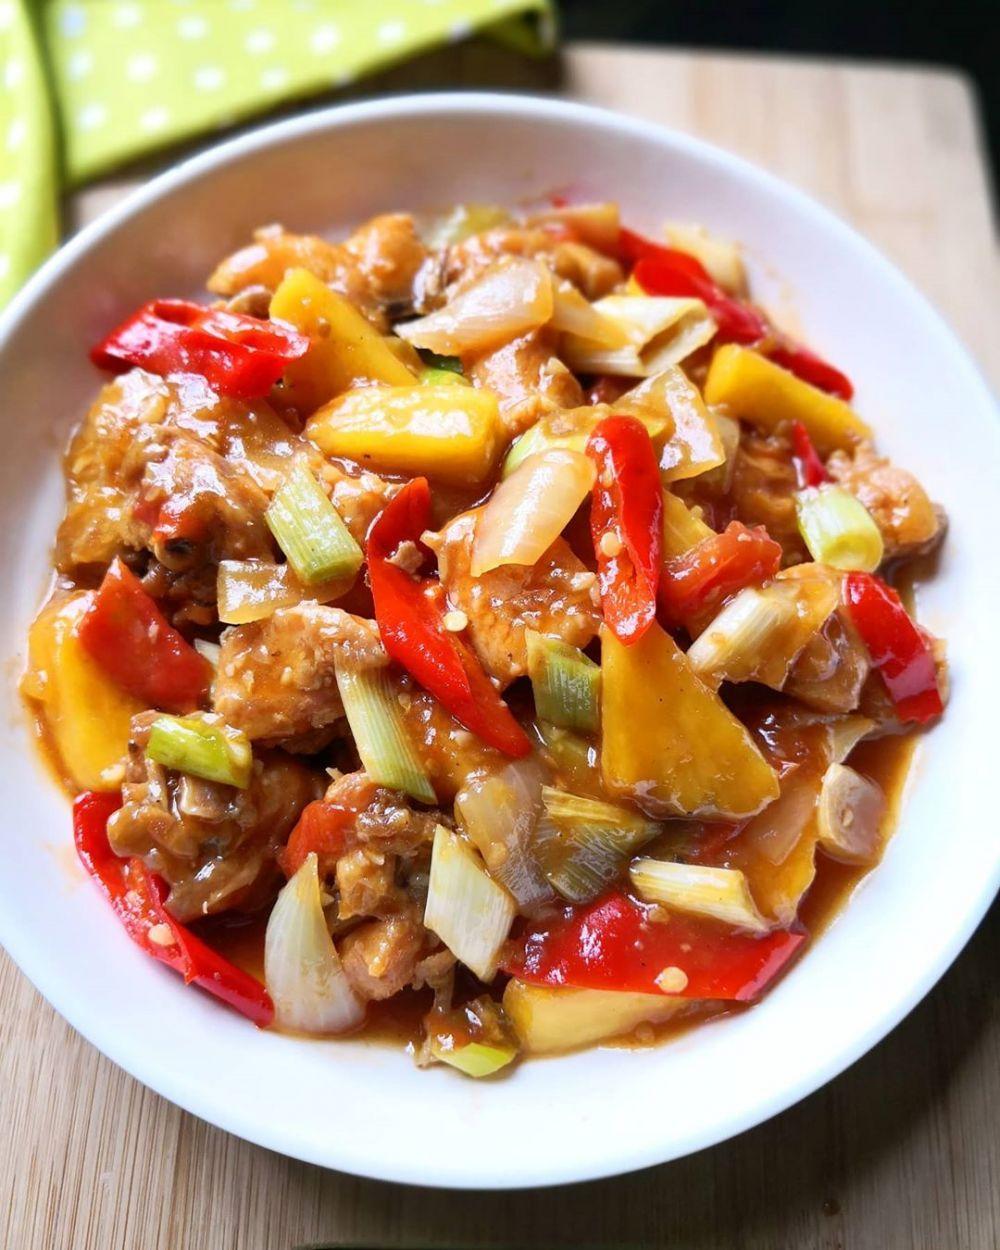 Resep Ayam Asam Manis C 2020 Instagram Maybelin Ma Instagram Mrs Wijaya Di 2021 Resep Ayam Babi Asam Manis Resep Masakan Sehat